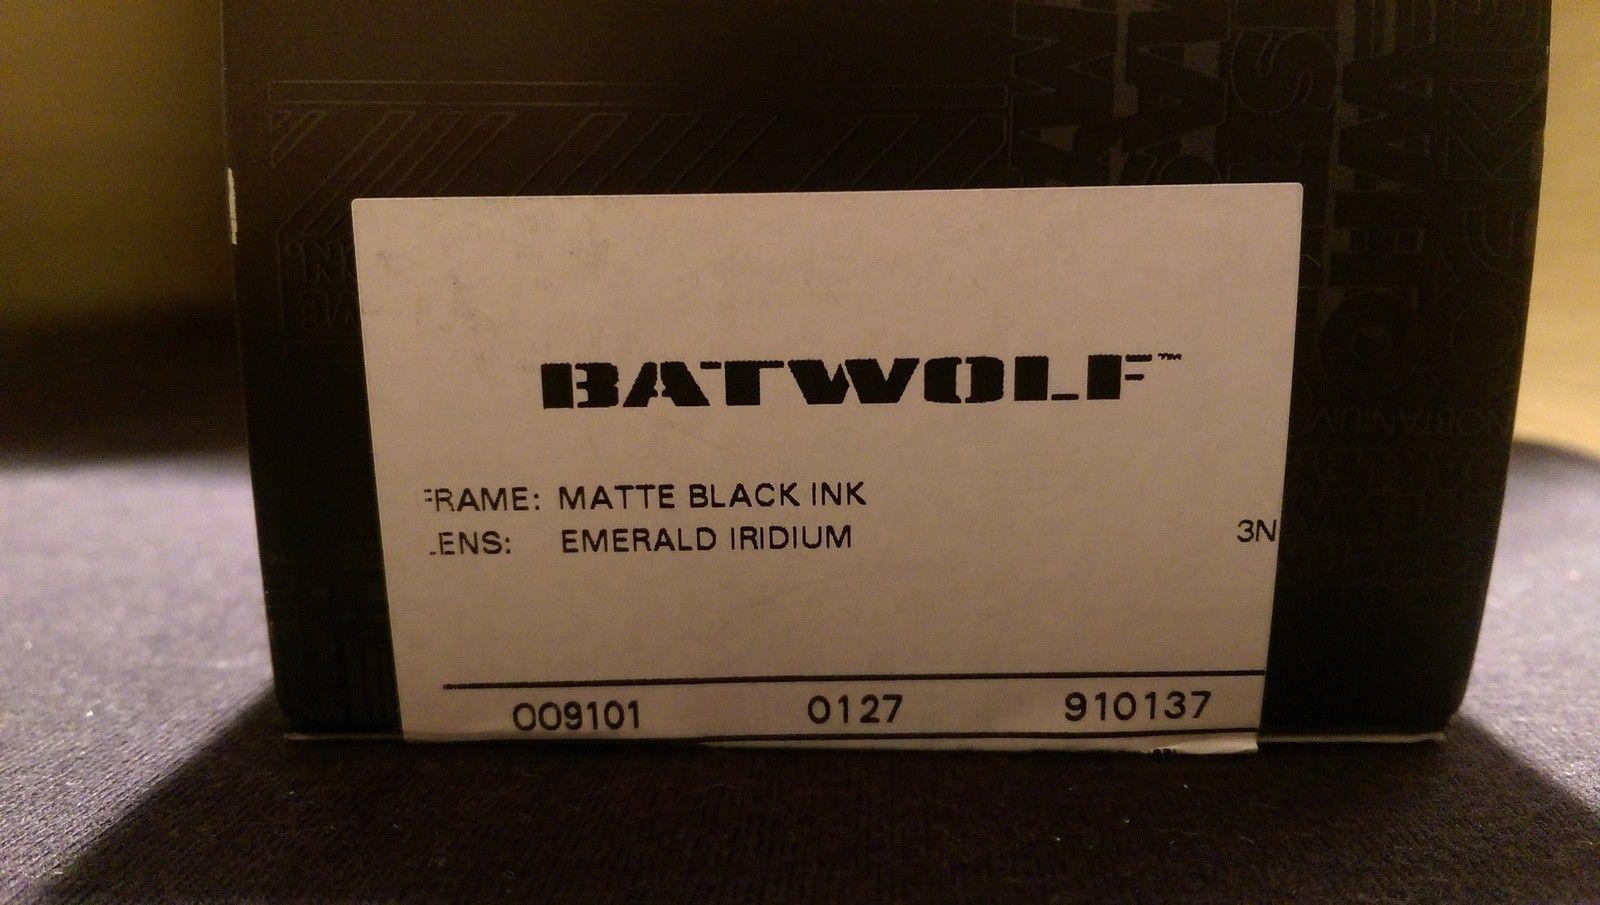 BNIB Batwolfs various sku ***Price drop*** - uploadfromtaptalk1453322173989.jpg